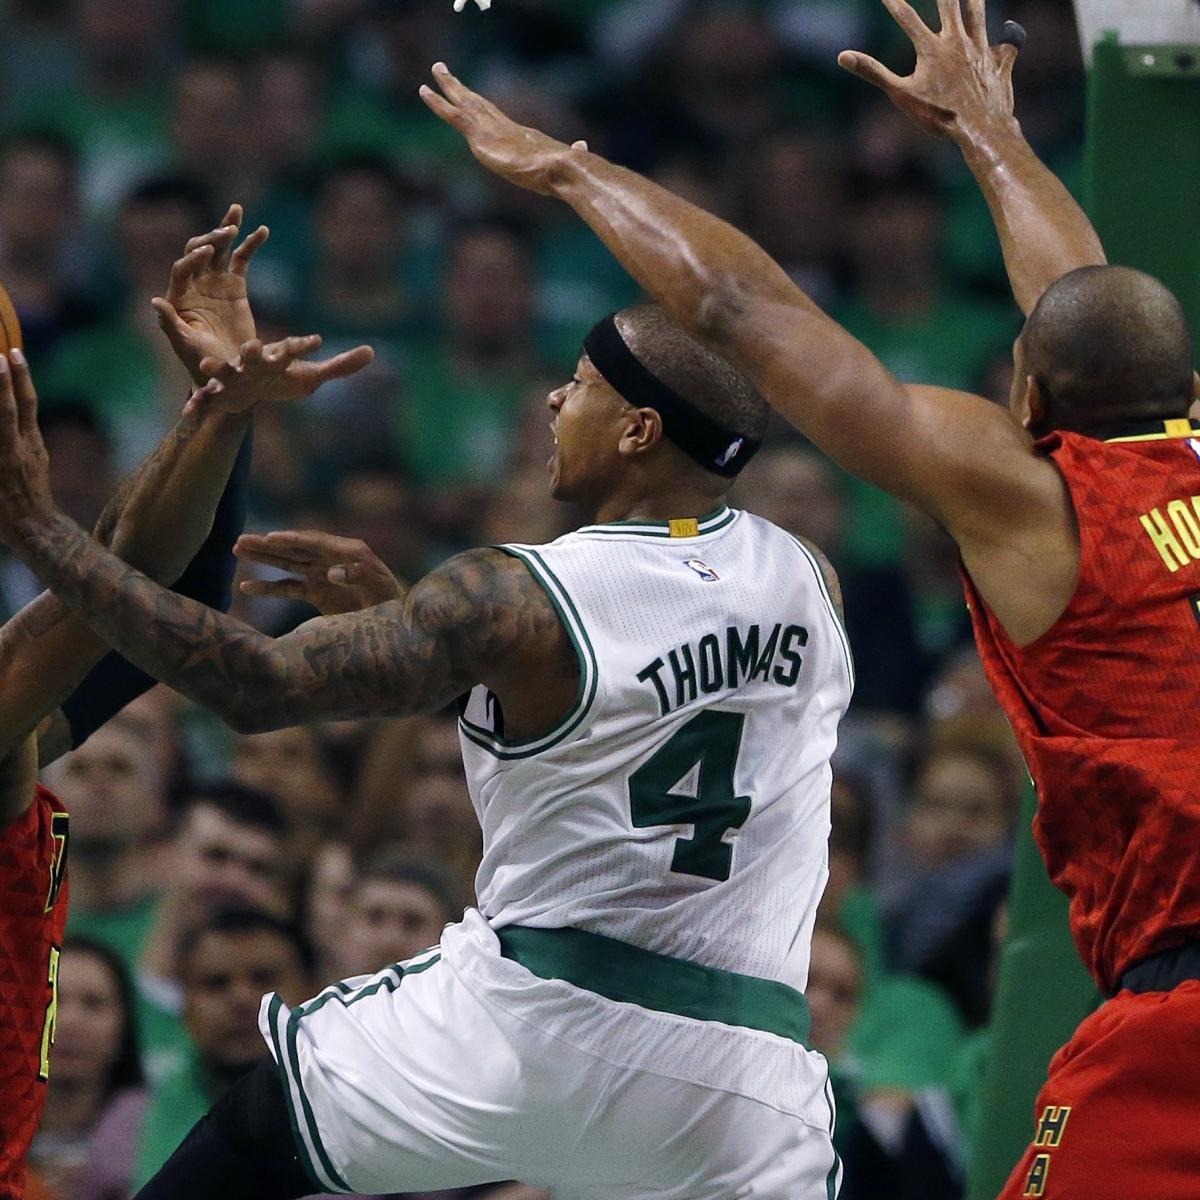 Celtics hawks betting previews forumdeluxx bitcoins